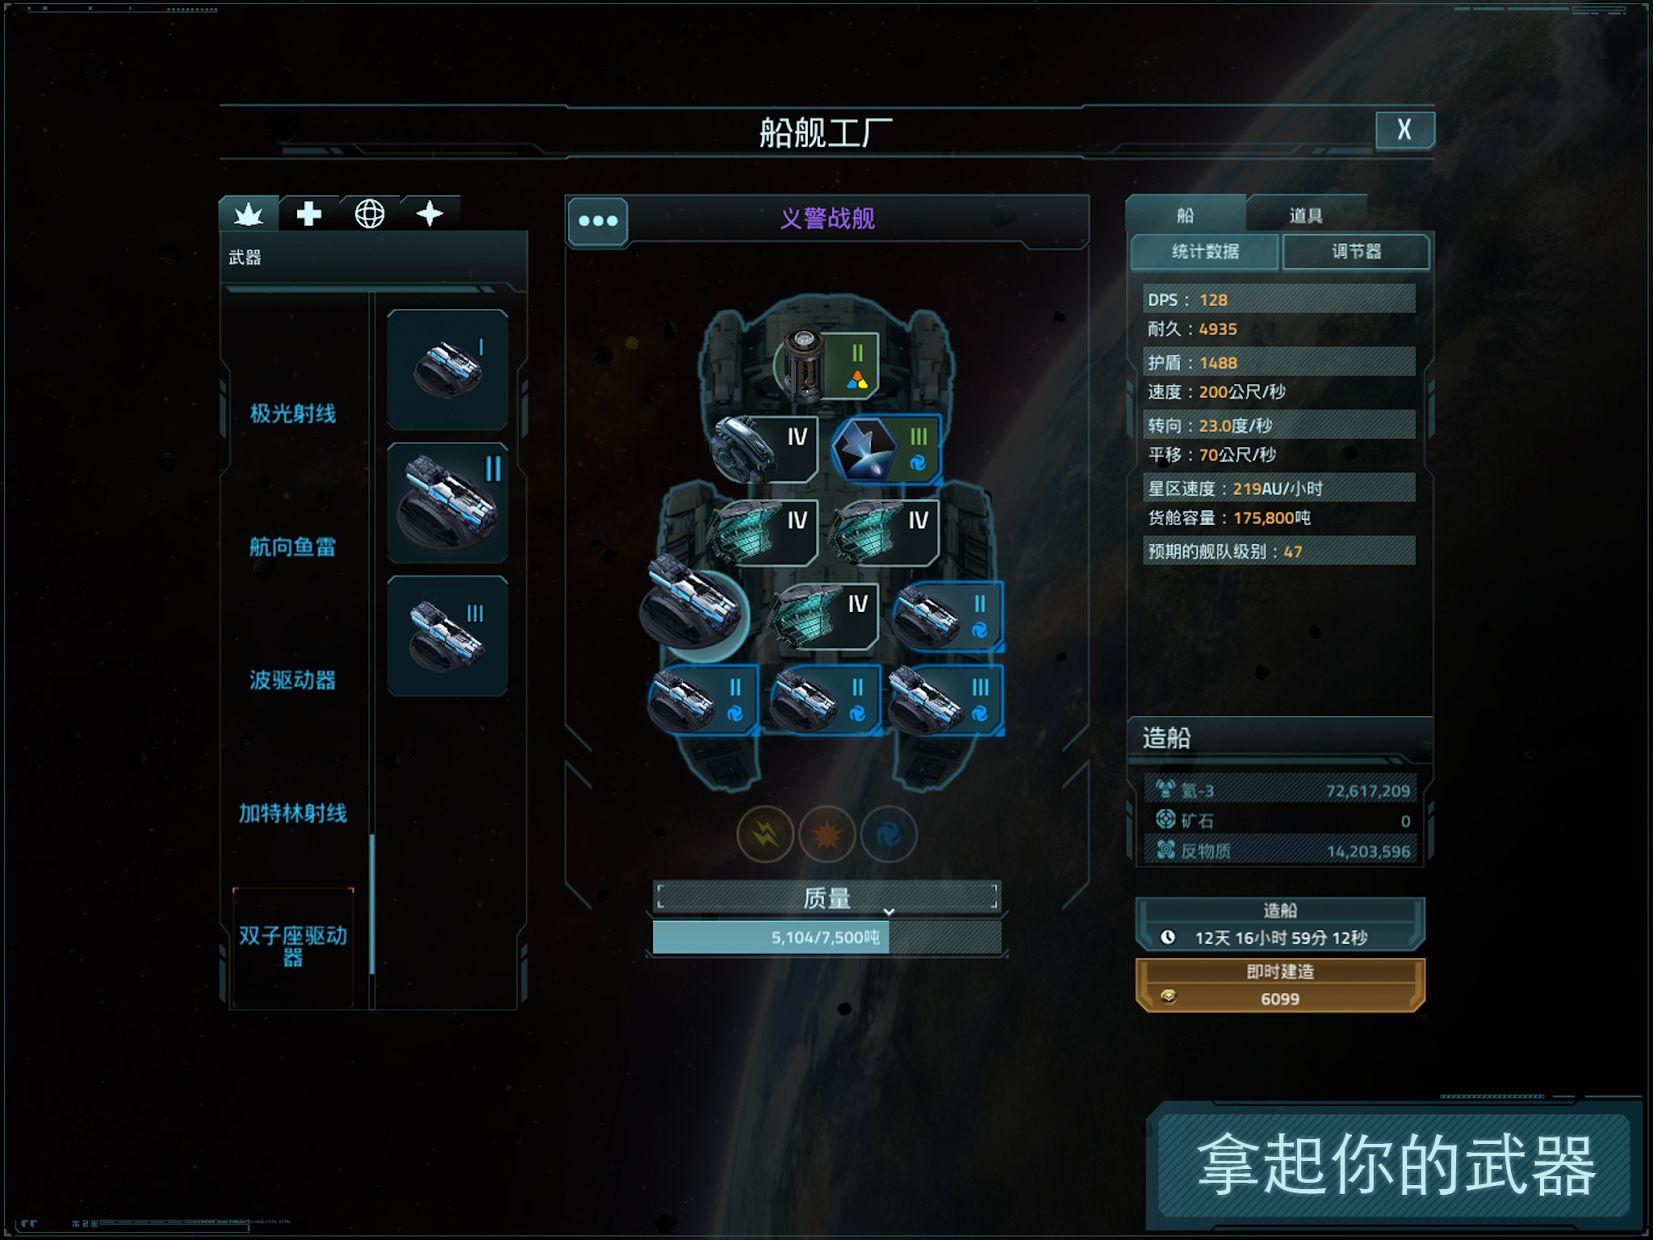 VEGA Conflict 游戏截图5